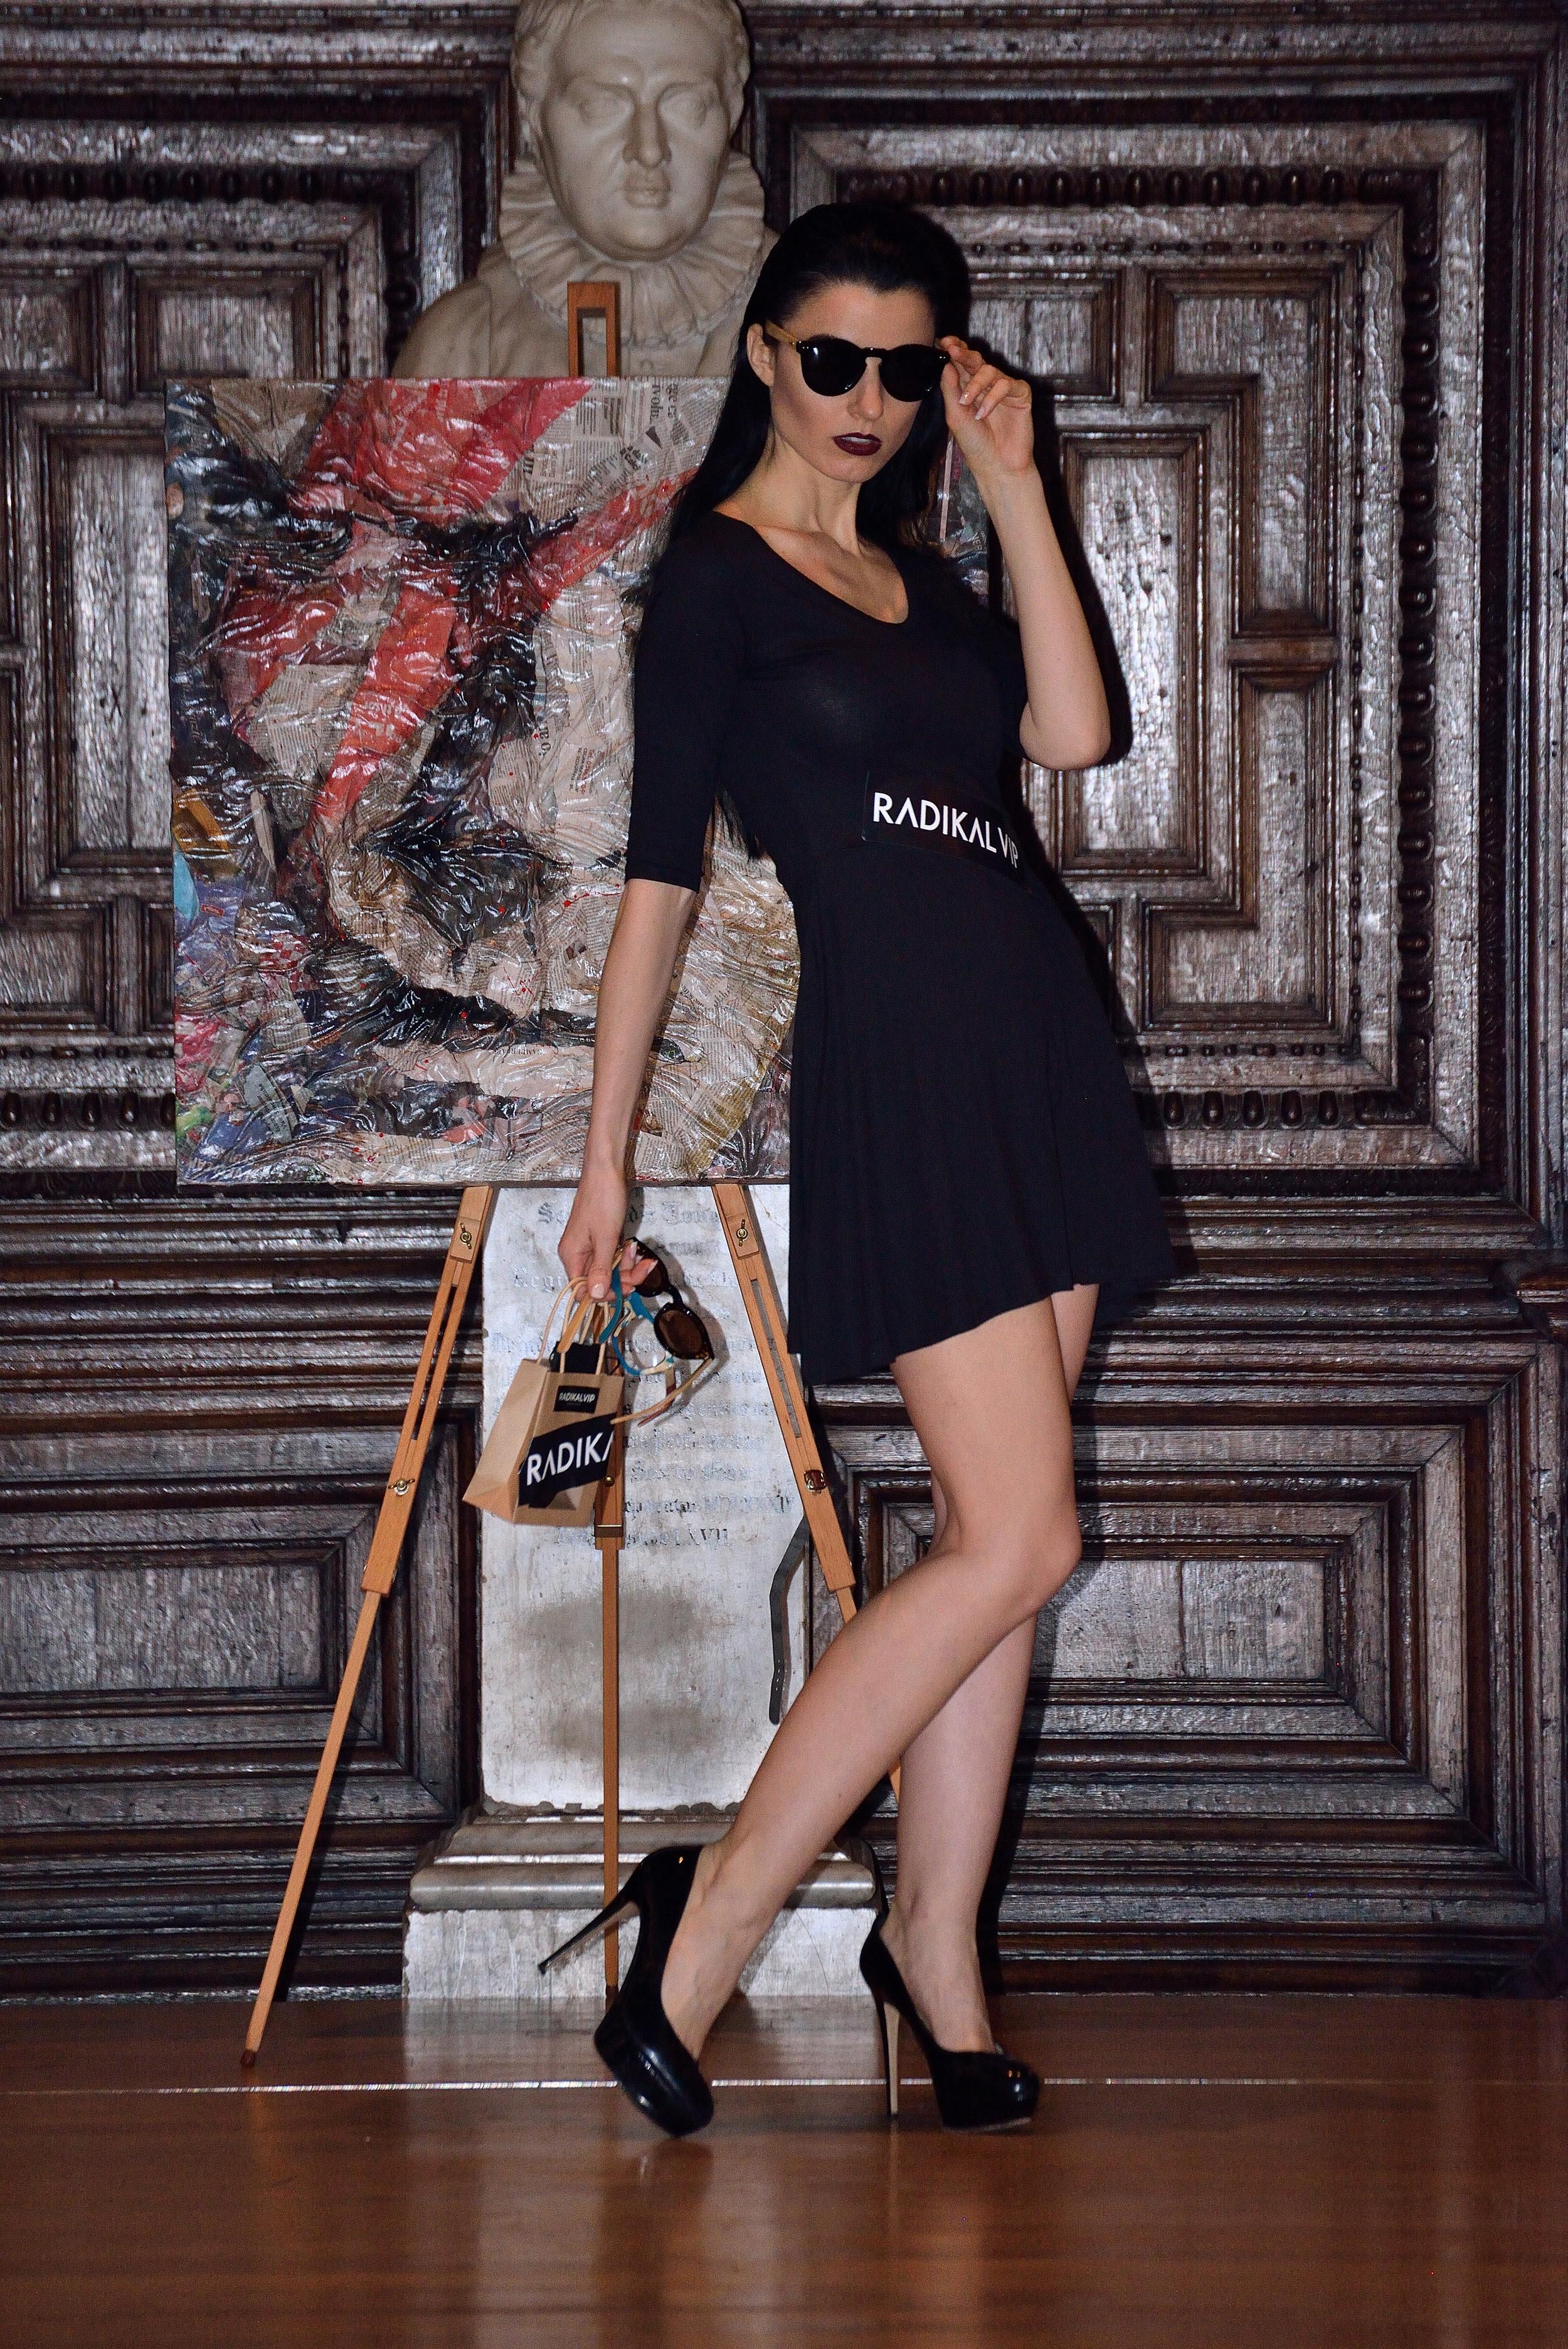 royal fashio day london fashion week5 copy.JPG